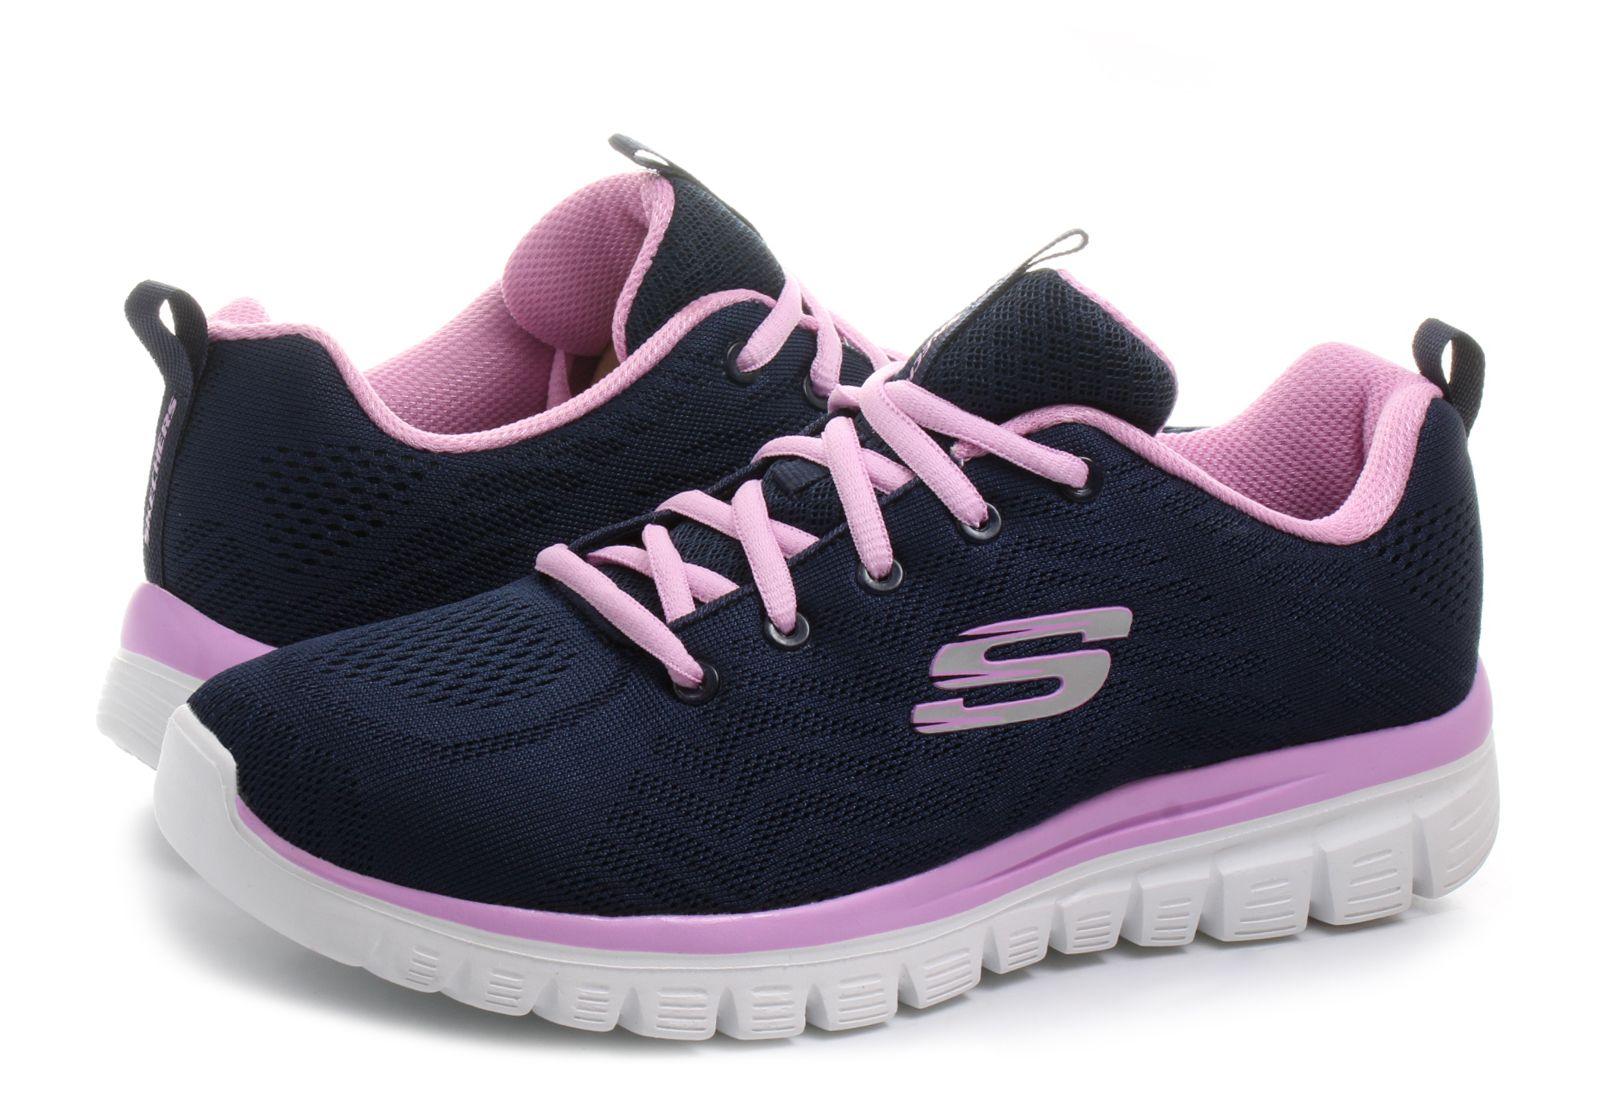 78476ada1a4f Skechers Shoes - Graceful-get Connected - 12615-nvpk - Online shop ...